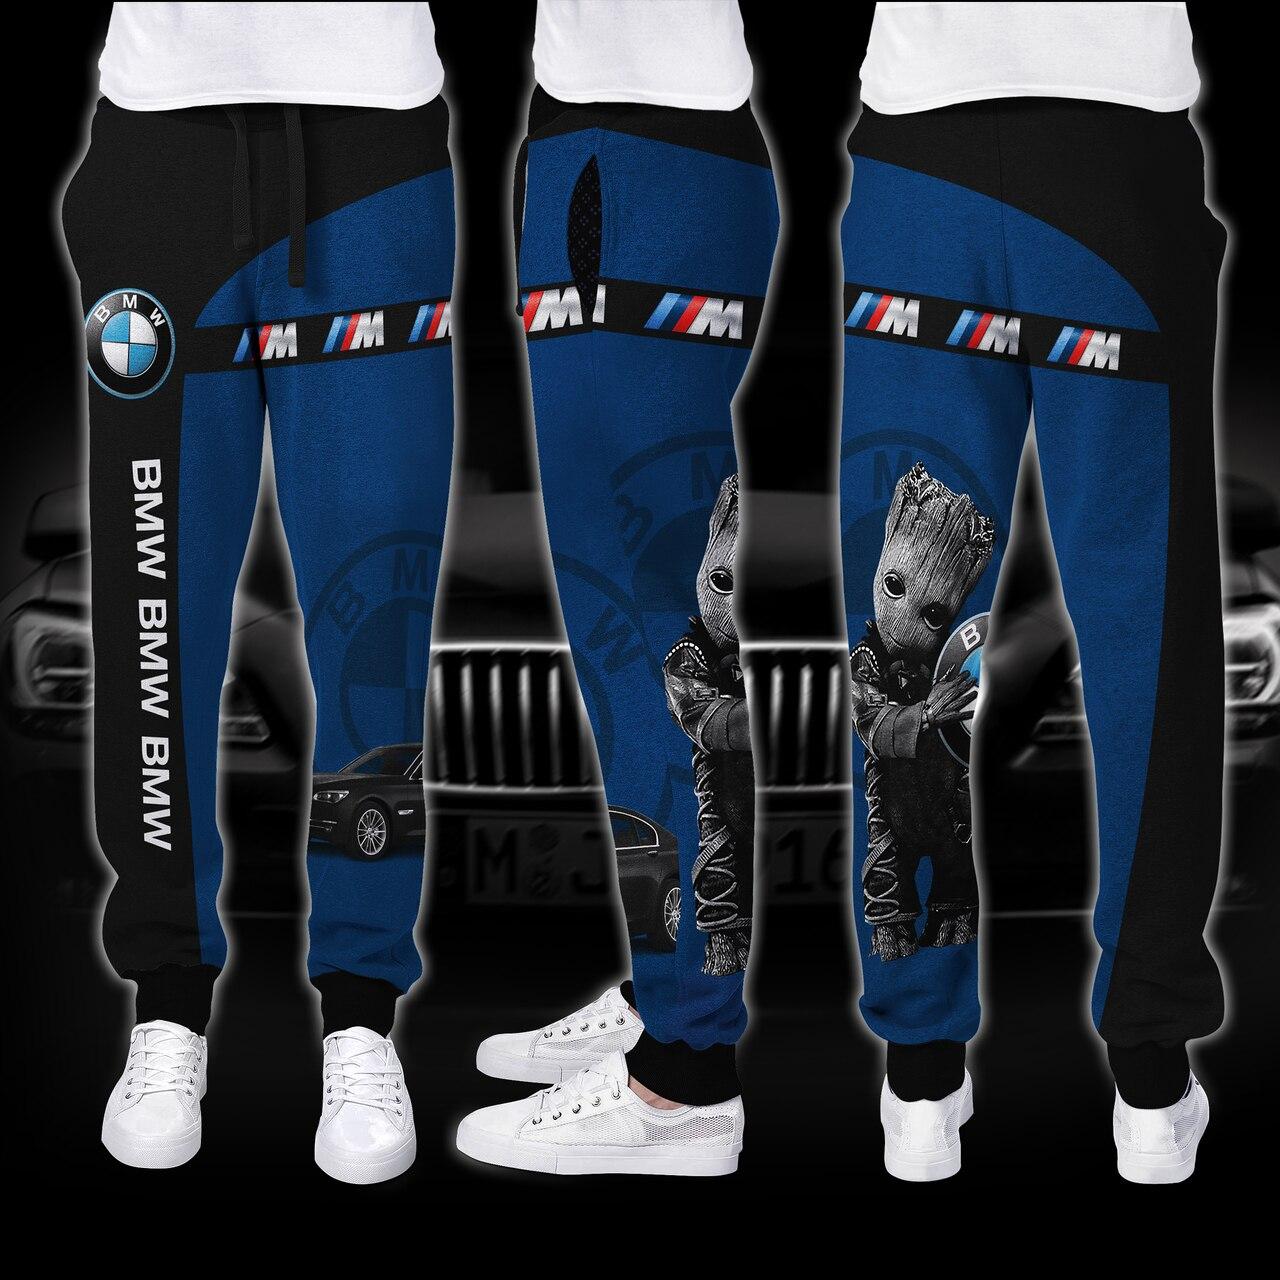 Baby groot hold bmw logo full printing long-pant